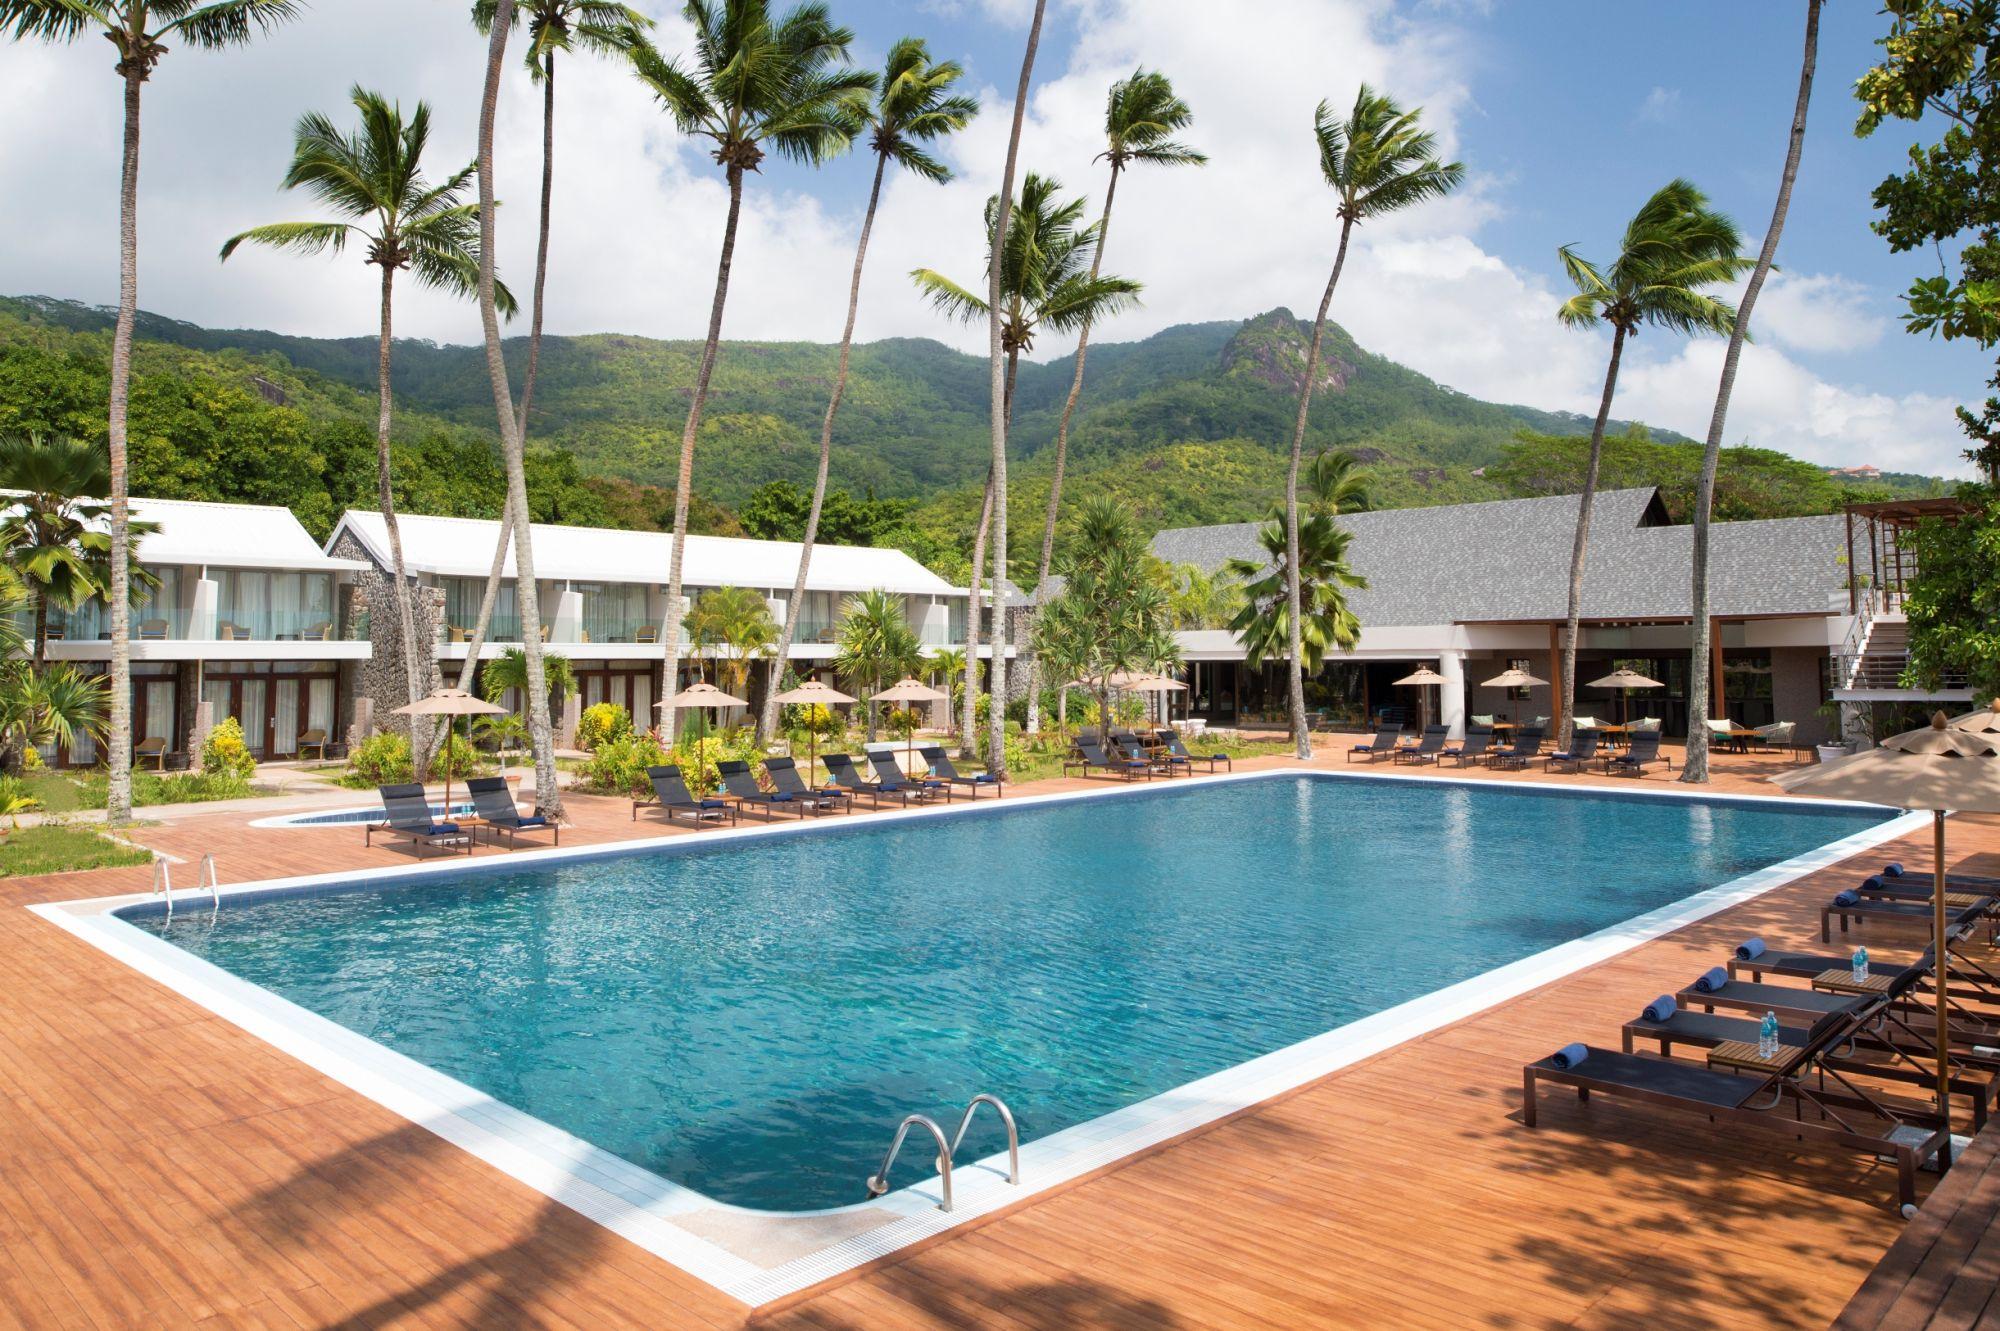 AVANI_Seychelles_Pool_With_Mountain_Backdrop